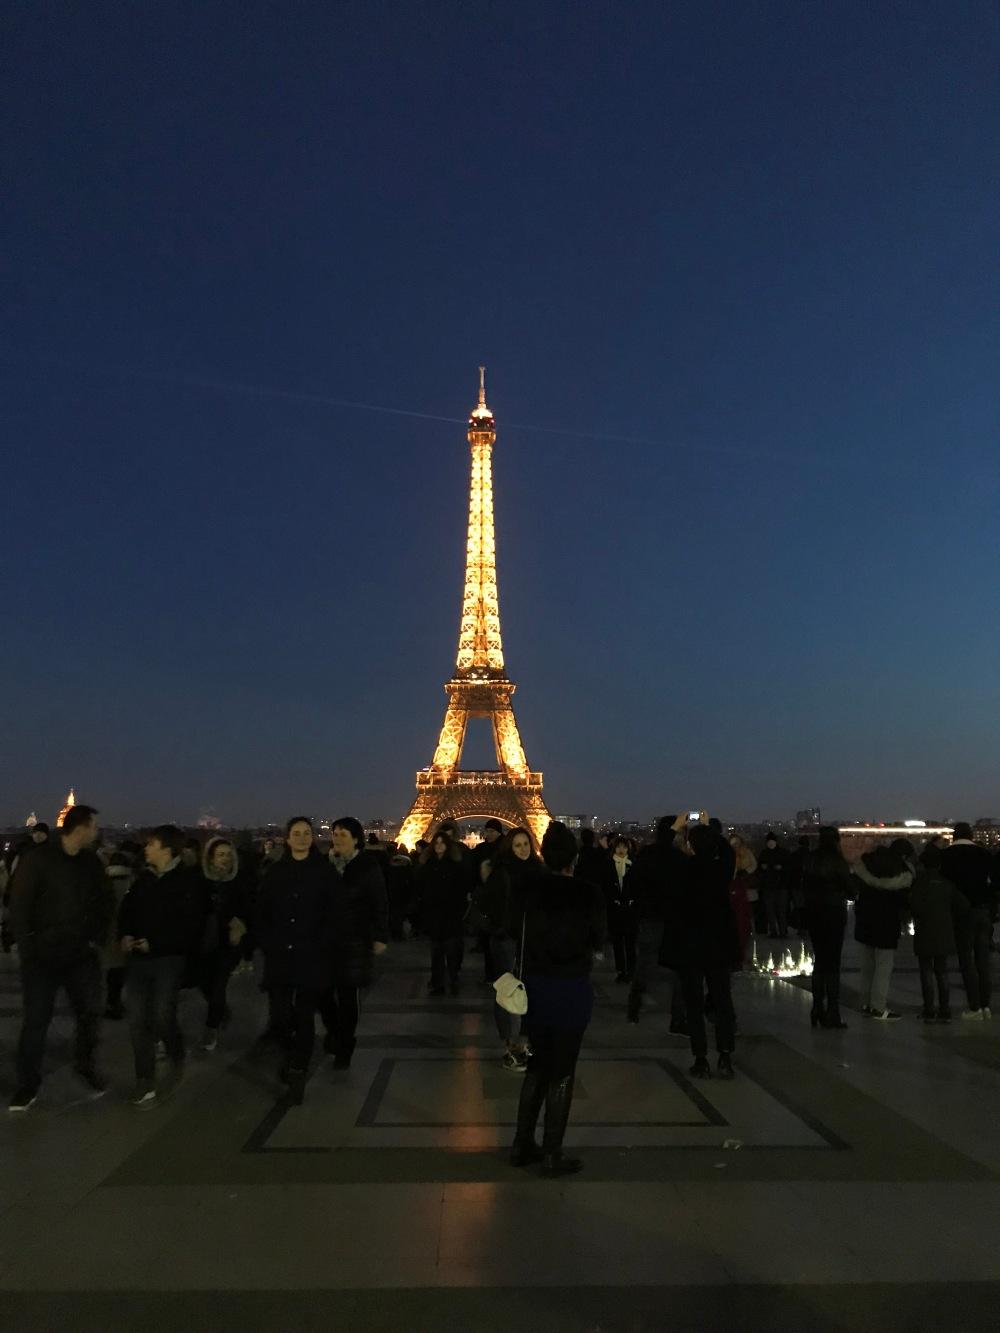 Torre Eiffel iluminada para o natal a noite